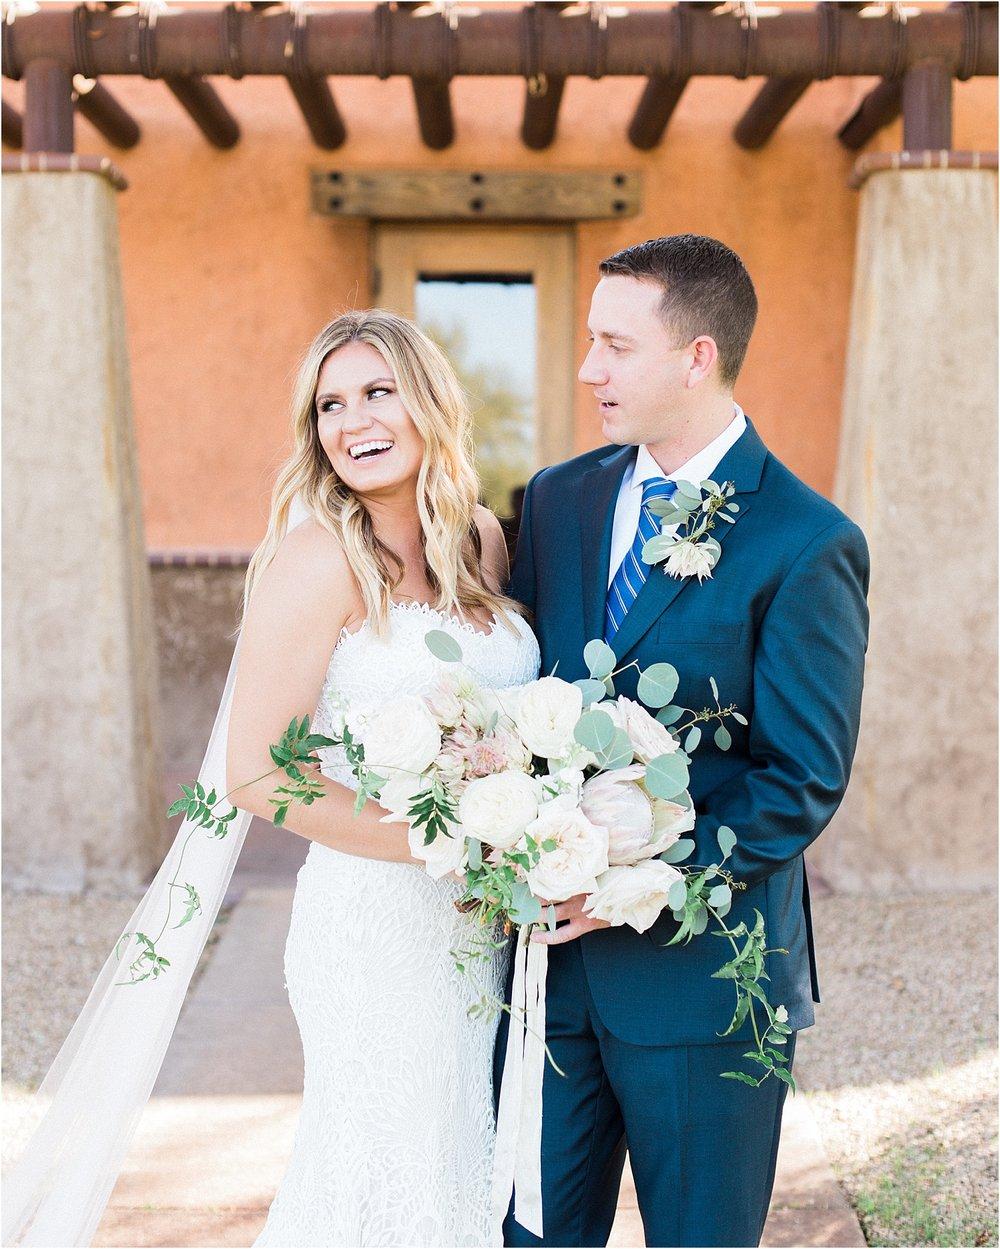 Arizona outdoor wedding7.jpg